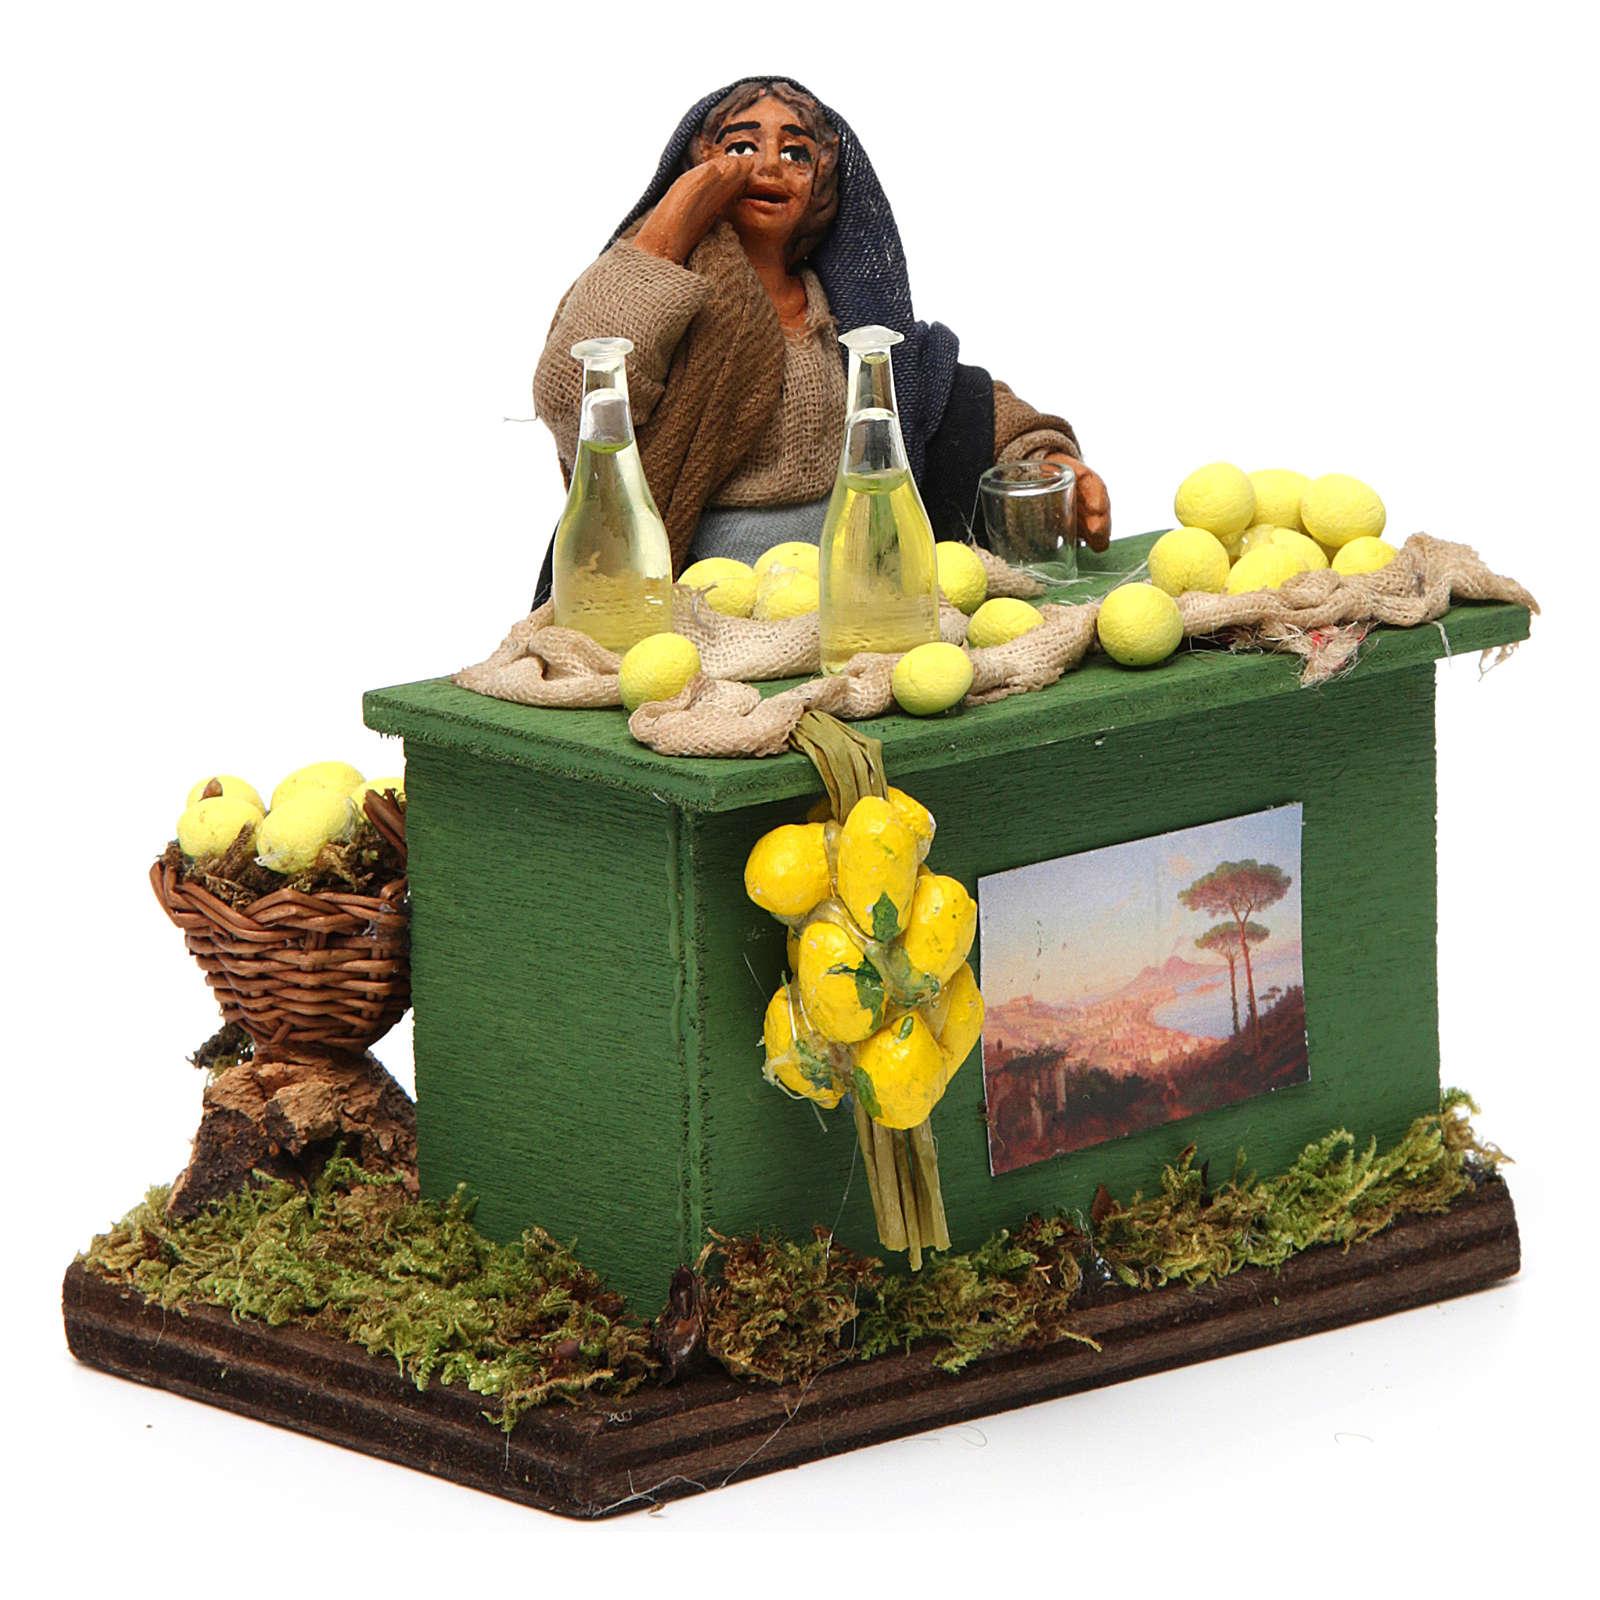 Lemon seller with stall, Neapolitan nativity figurine, 10cm 4